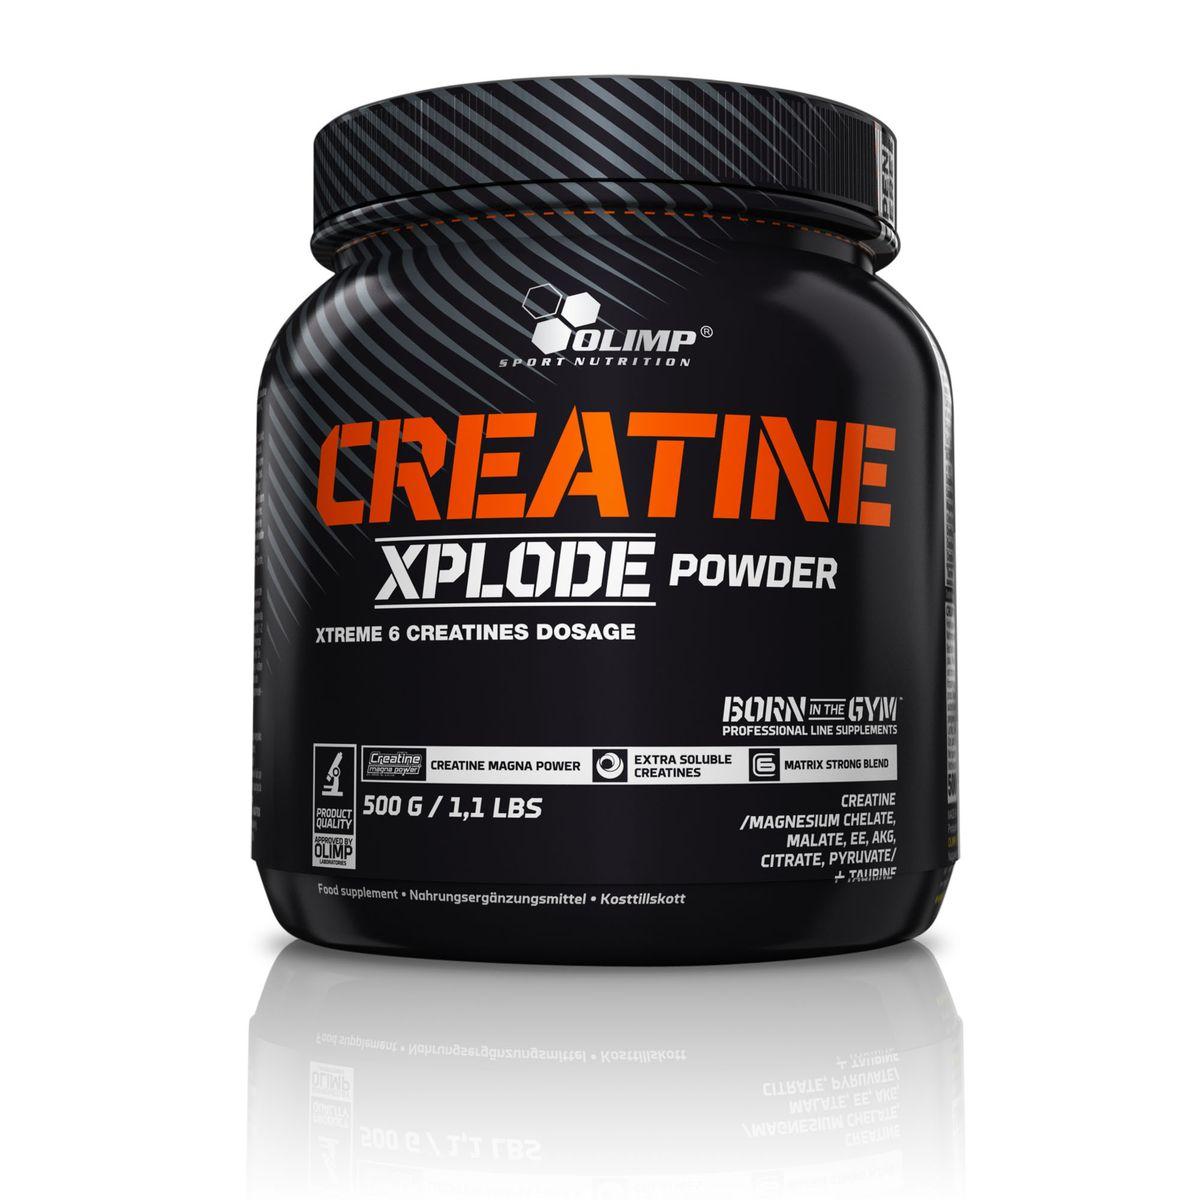 Креатин Olimp Sport Nutrition Creatine Xplode Powder, апельсин, 500 г dymatize nutrition моногидрат креатина dymatize creatine micronized 500гр